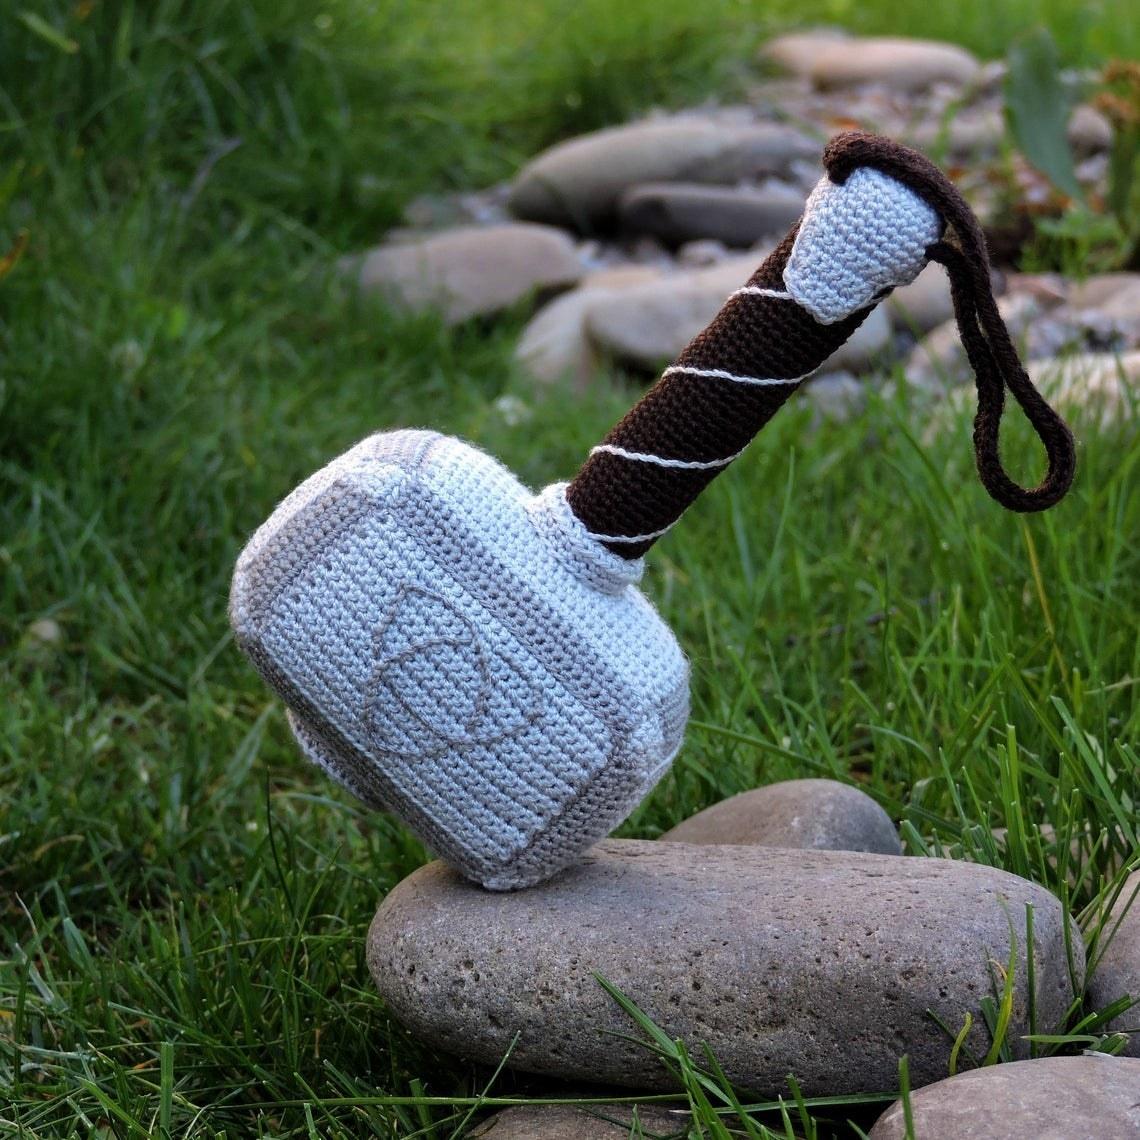 The stuffed hammer on a rock